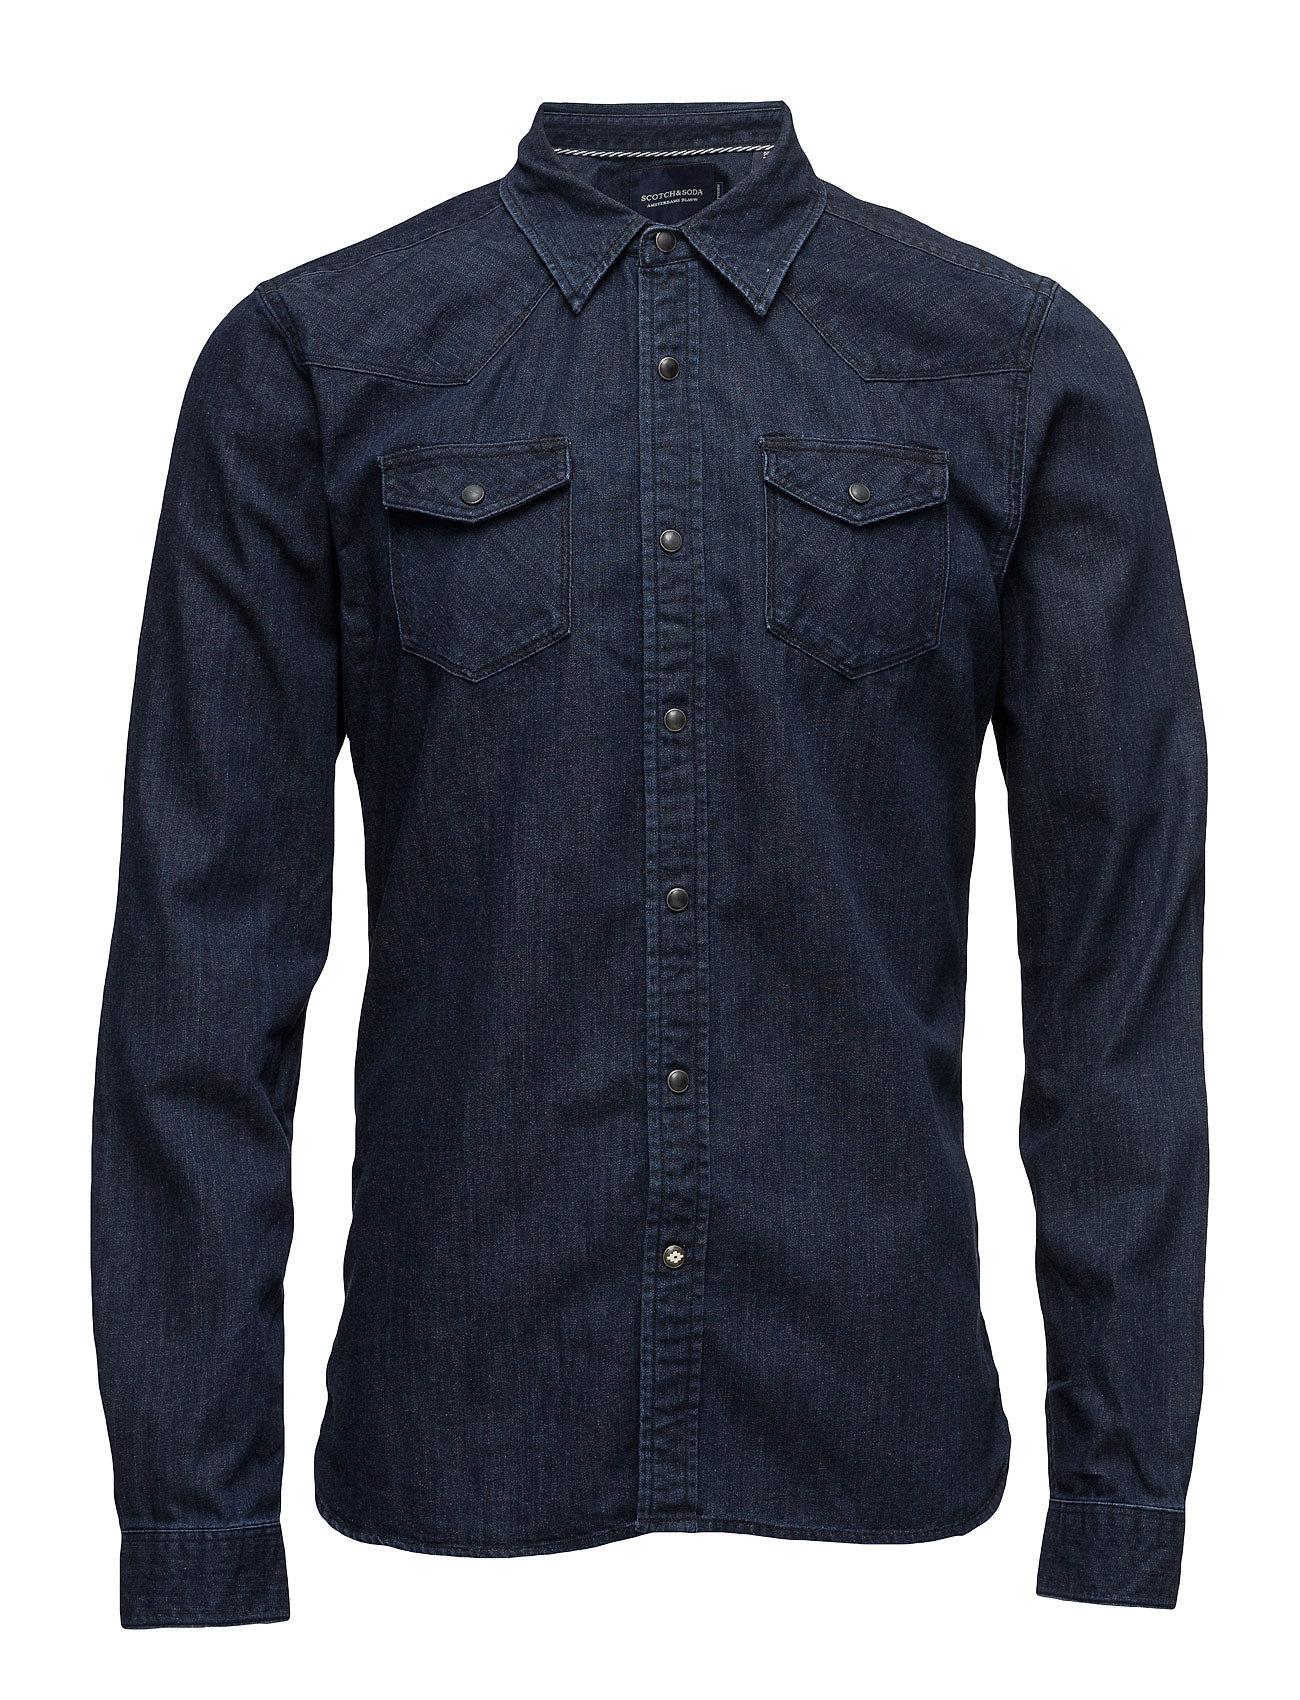 Ams blauw classic western shirt in regular fit fra scotch & soda på boozt.com dk